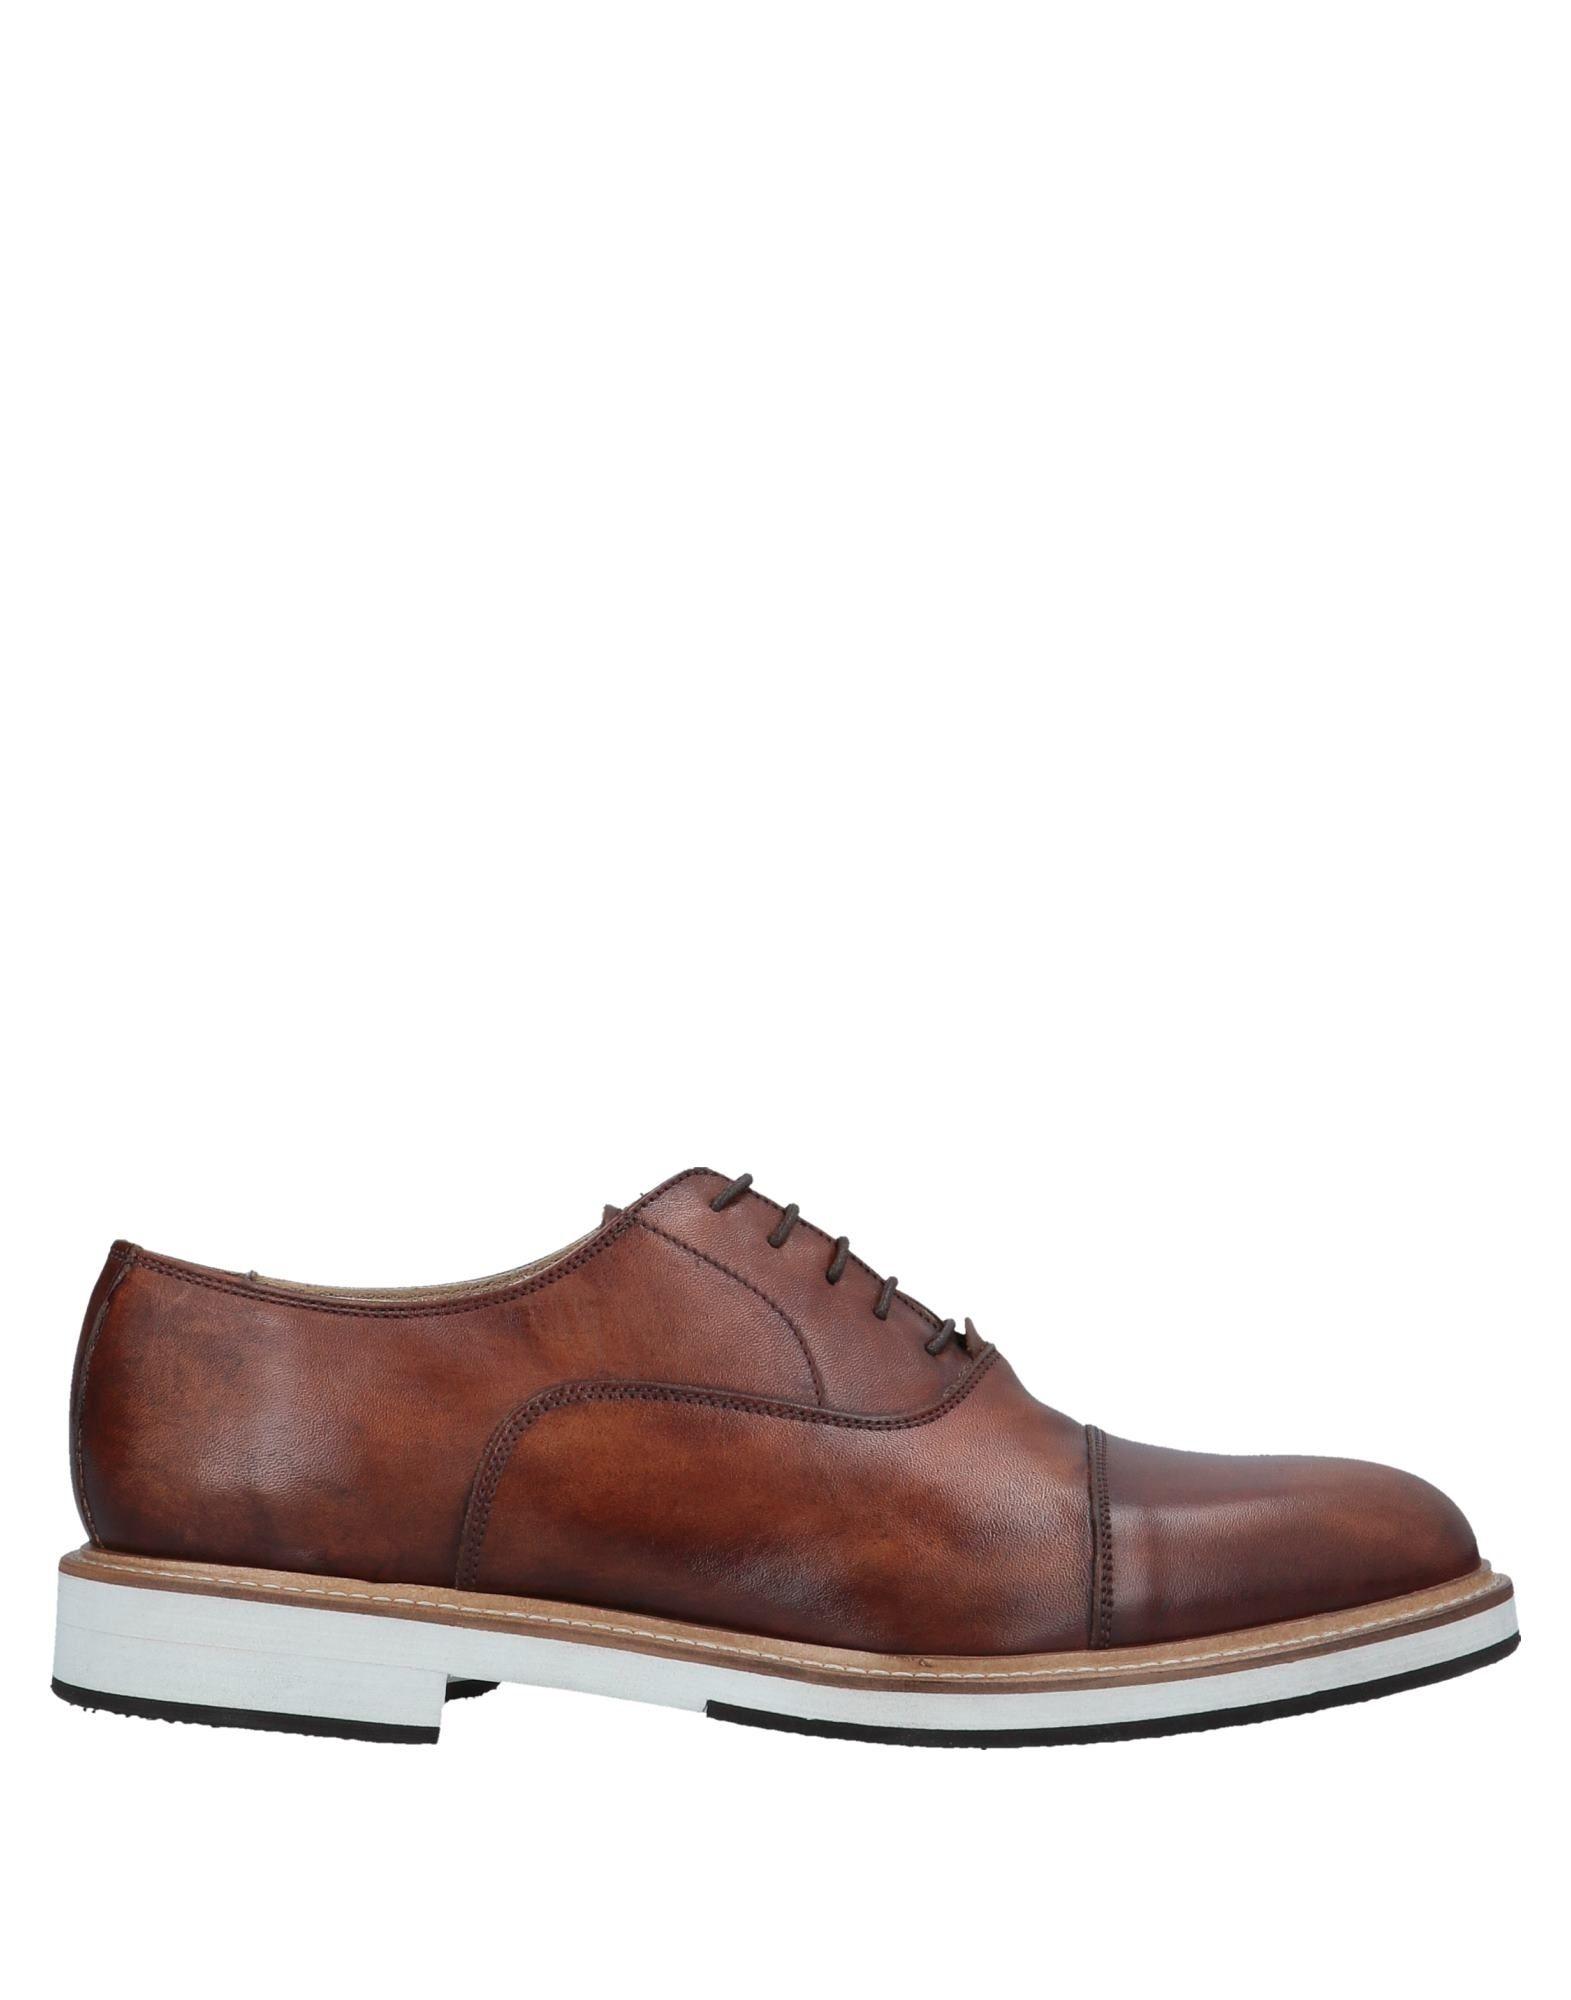 LE BILÒ Обувь на шнурках le blog обувь на танкетке